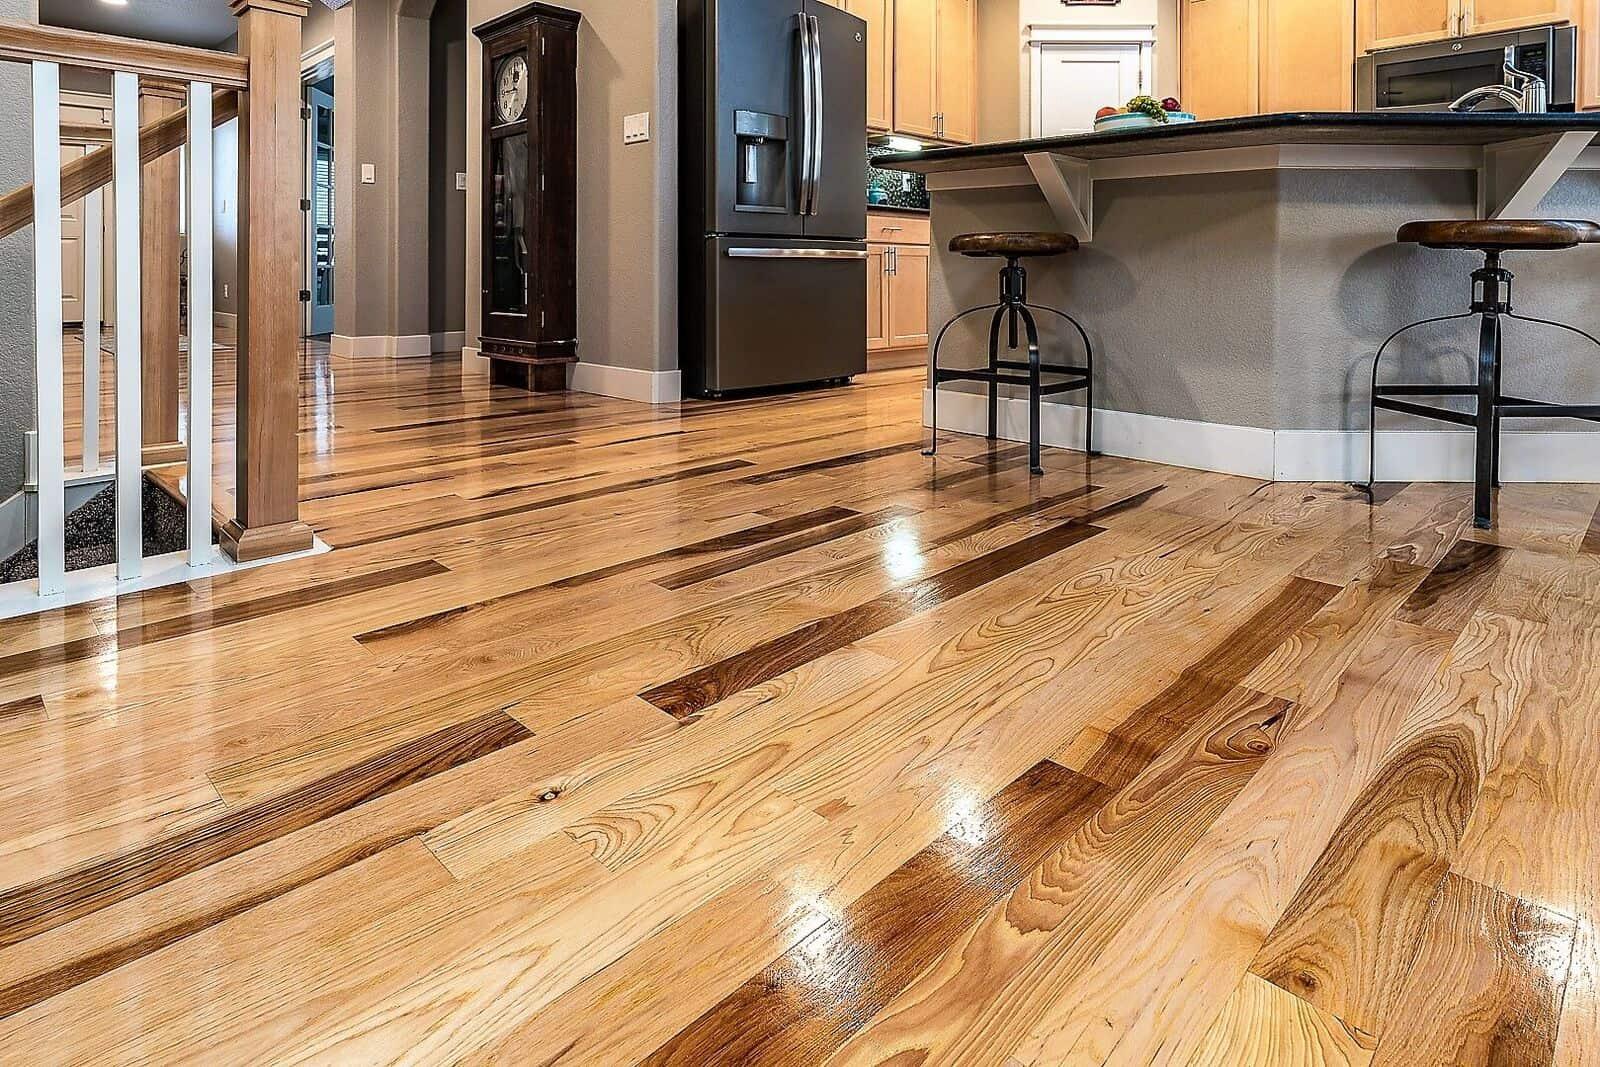 Gorgeous hickory floors